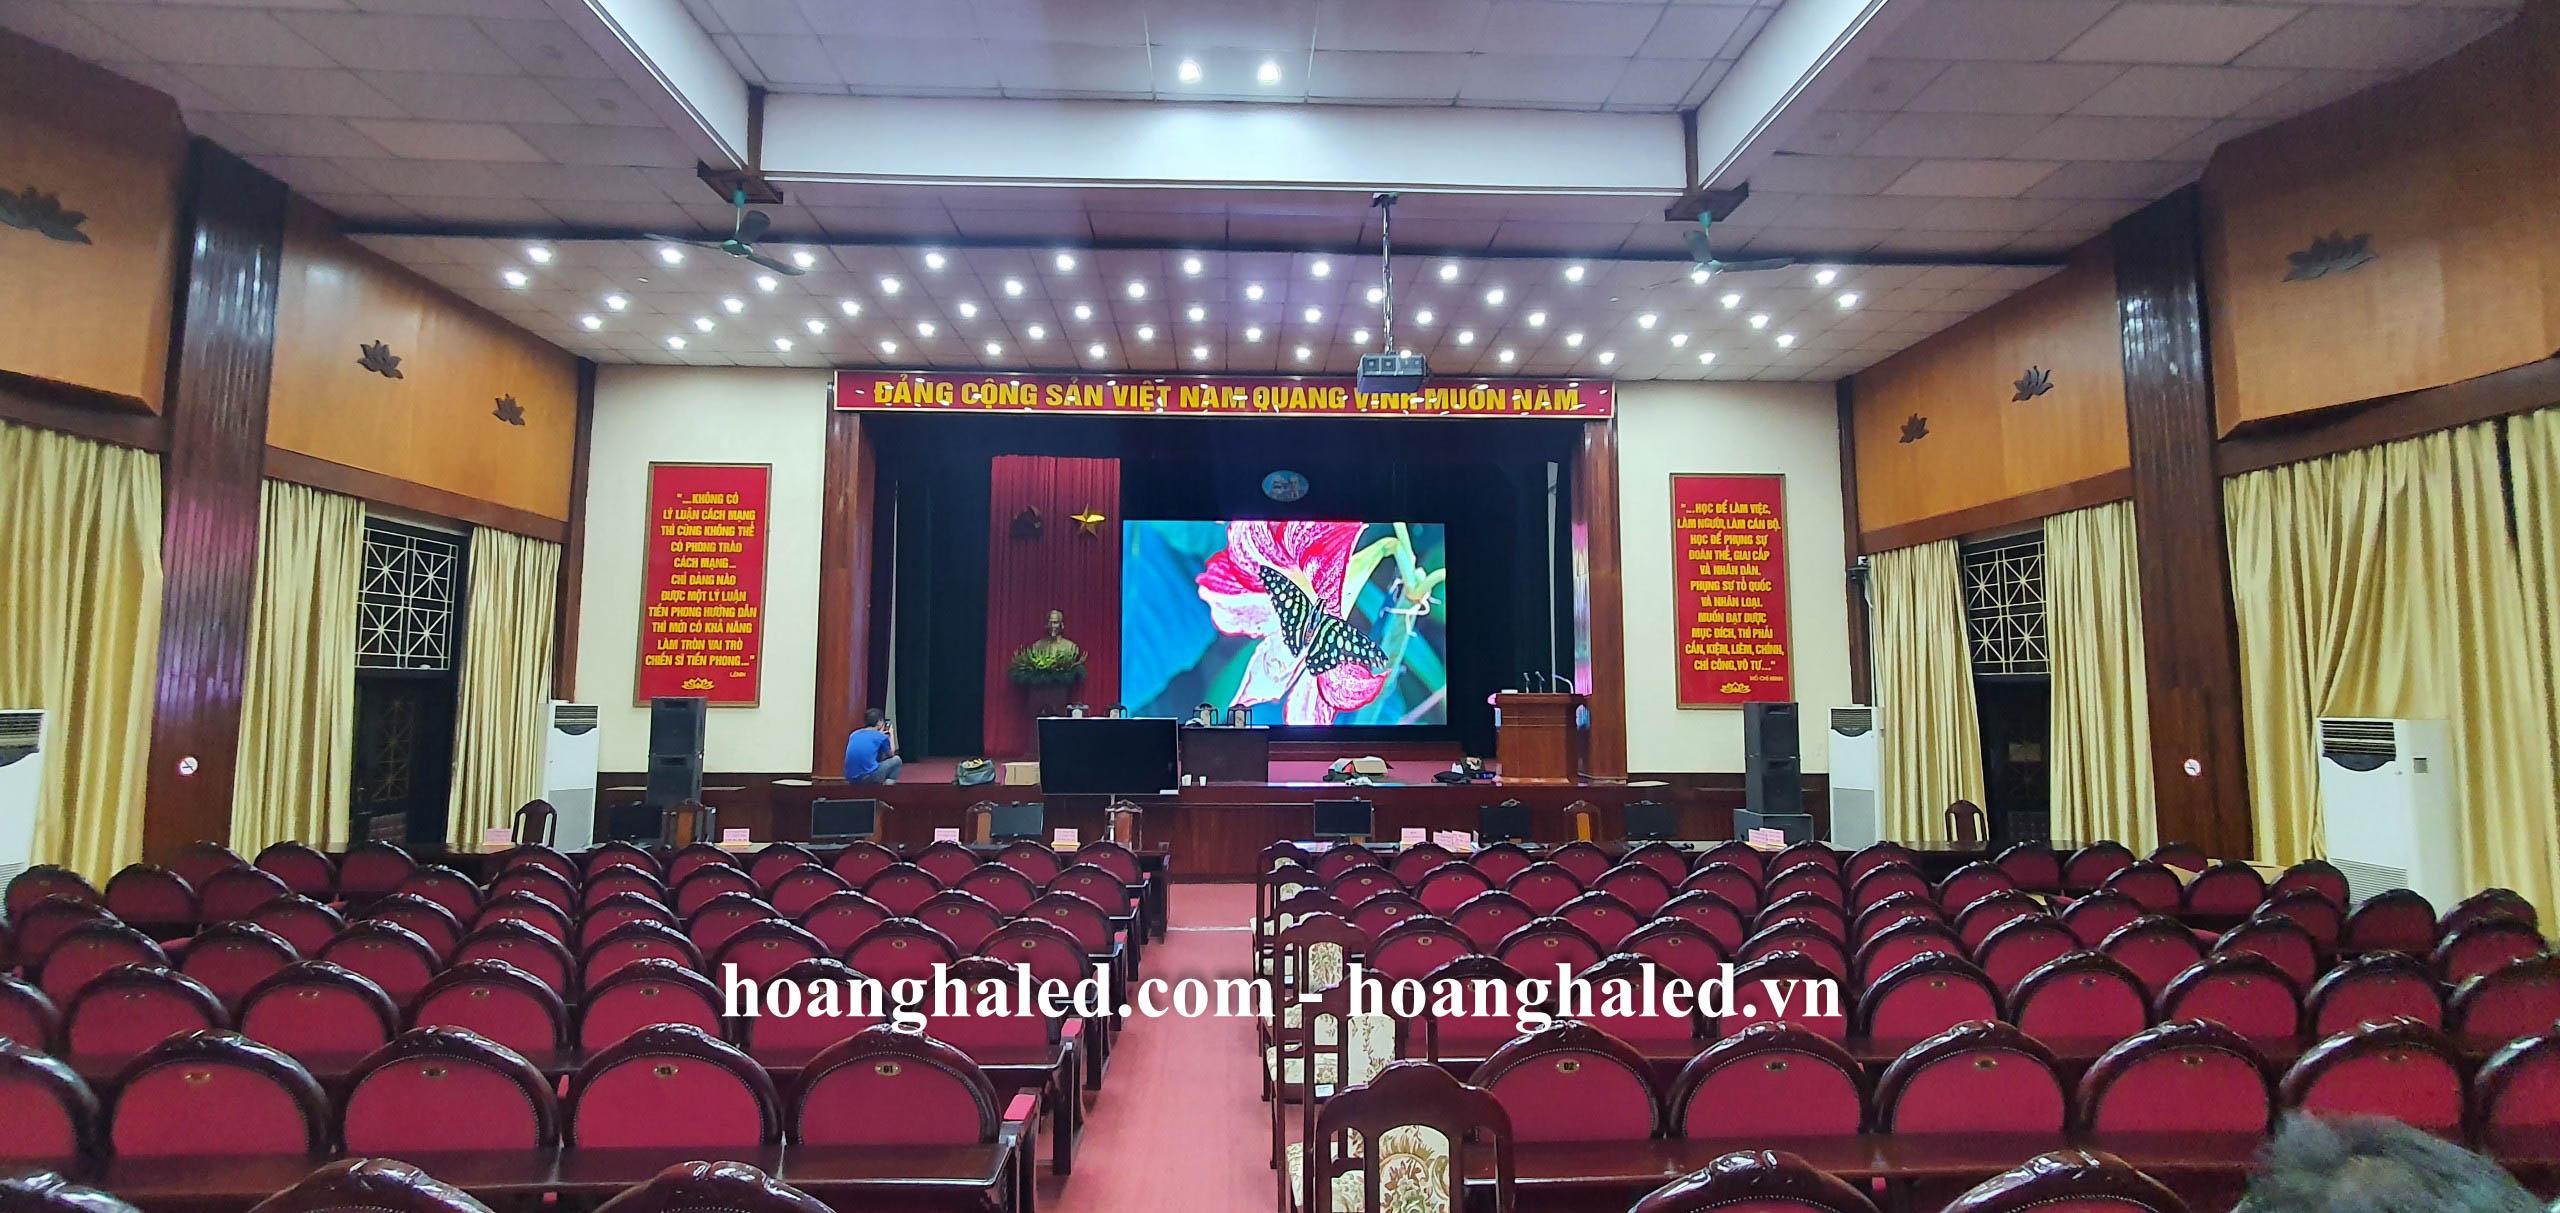 man_hinh_led_p3_trong_nha_tai_hoc_vien_chinh_tri_khu_vuc_i_8